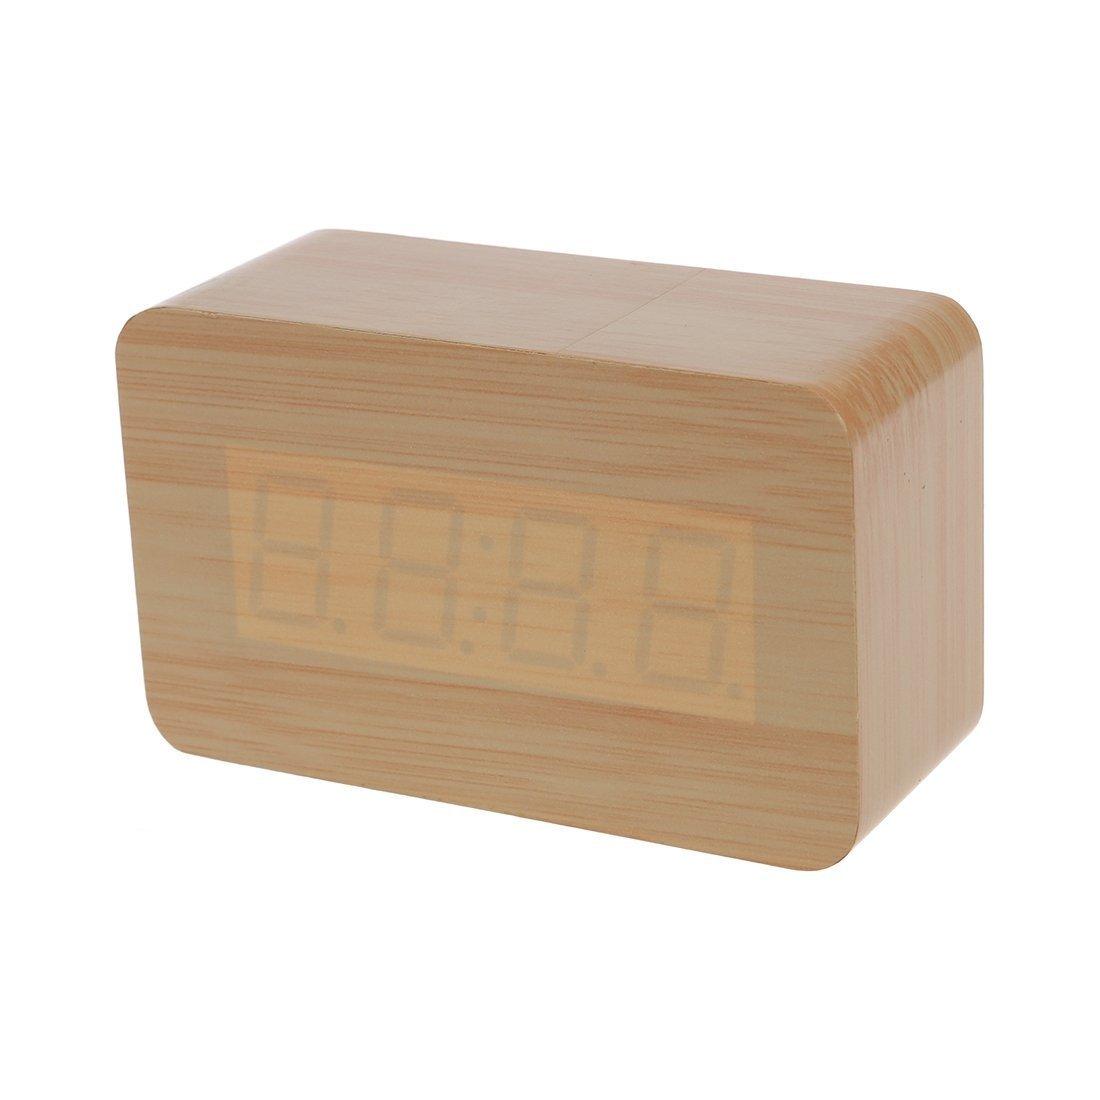 SODIAL(R) Moderno USB de madera de madera / AAA digital LED Reloj Alarma Calendario Termometro Nuevo: Amazon.es: Hogar